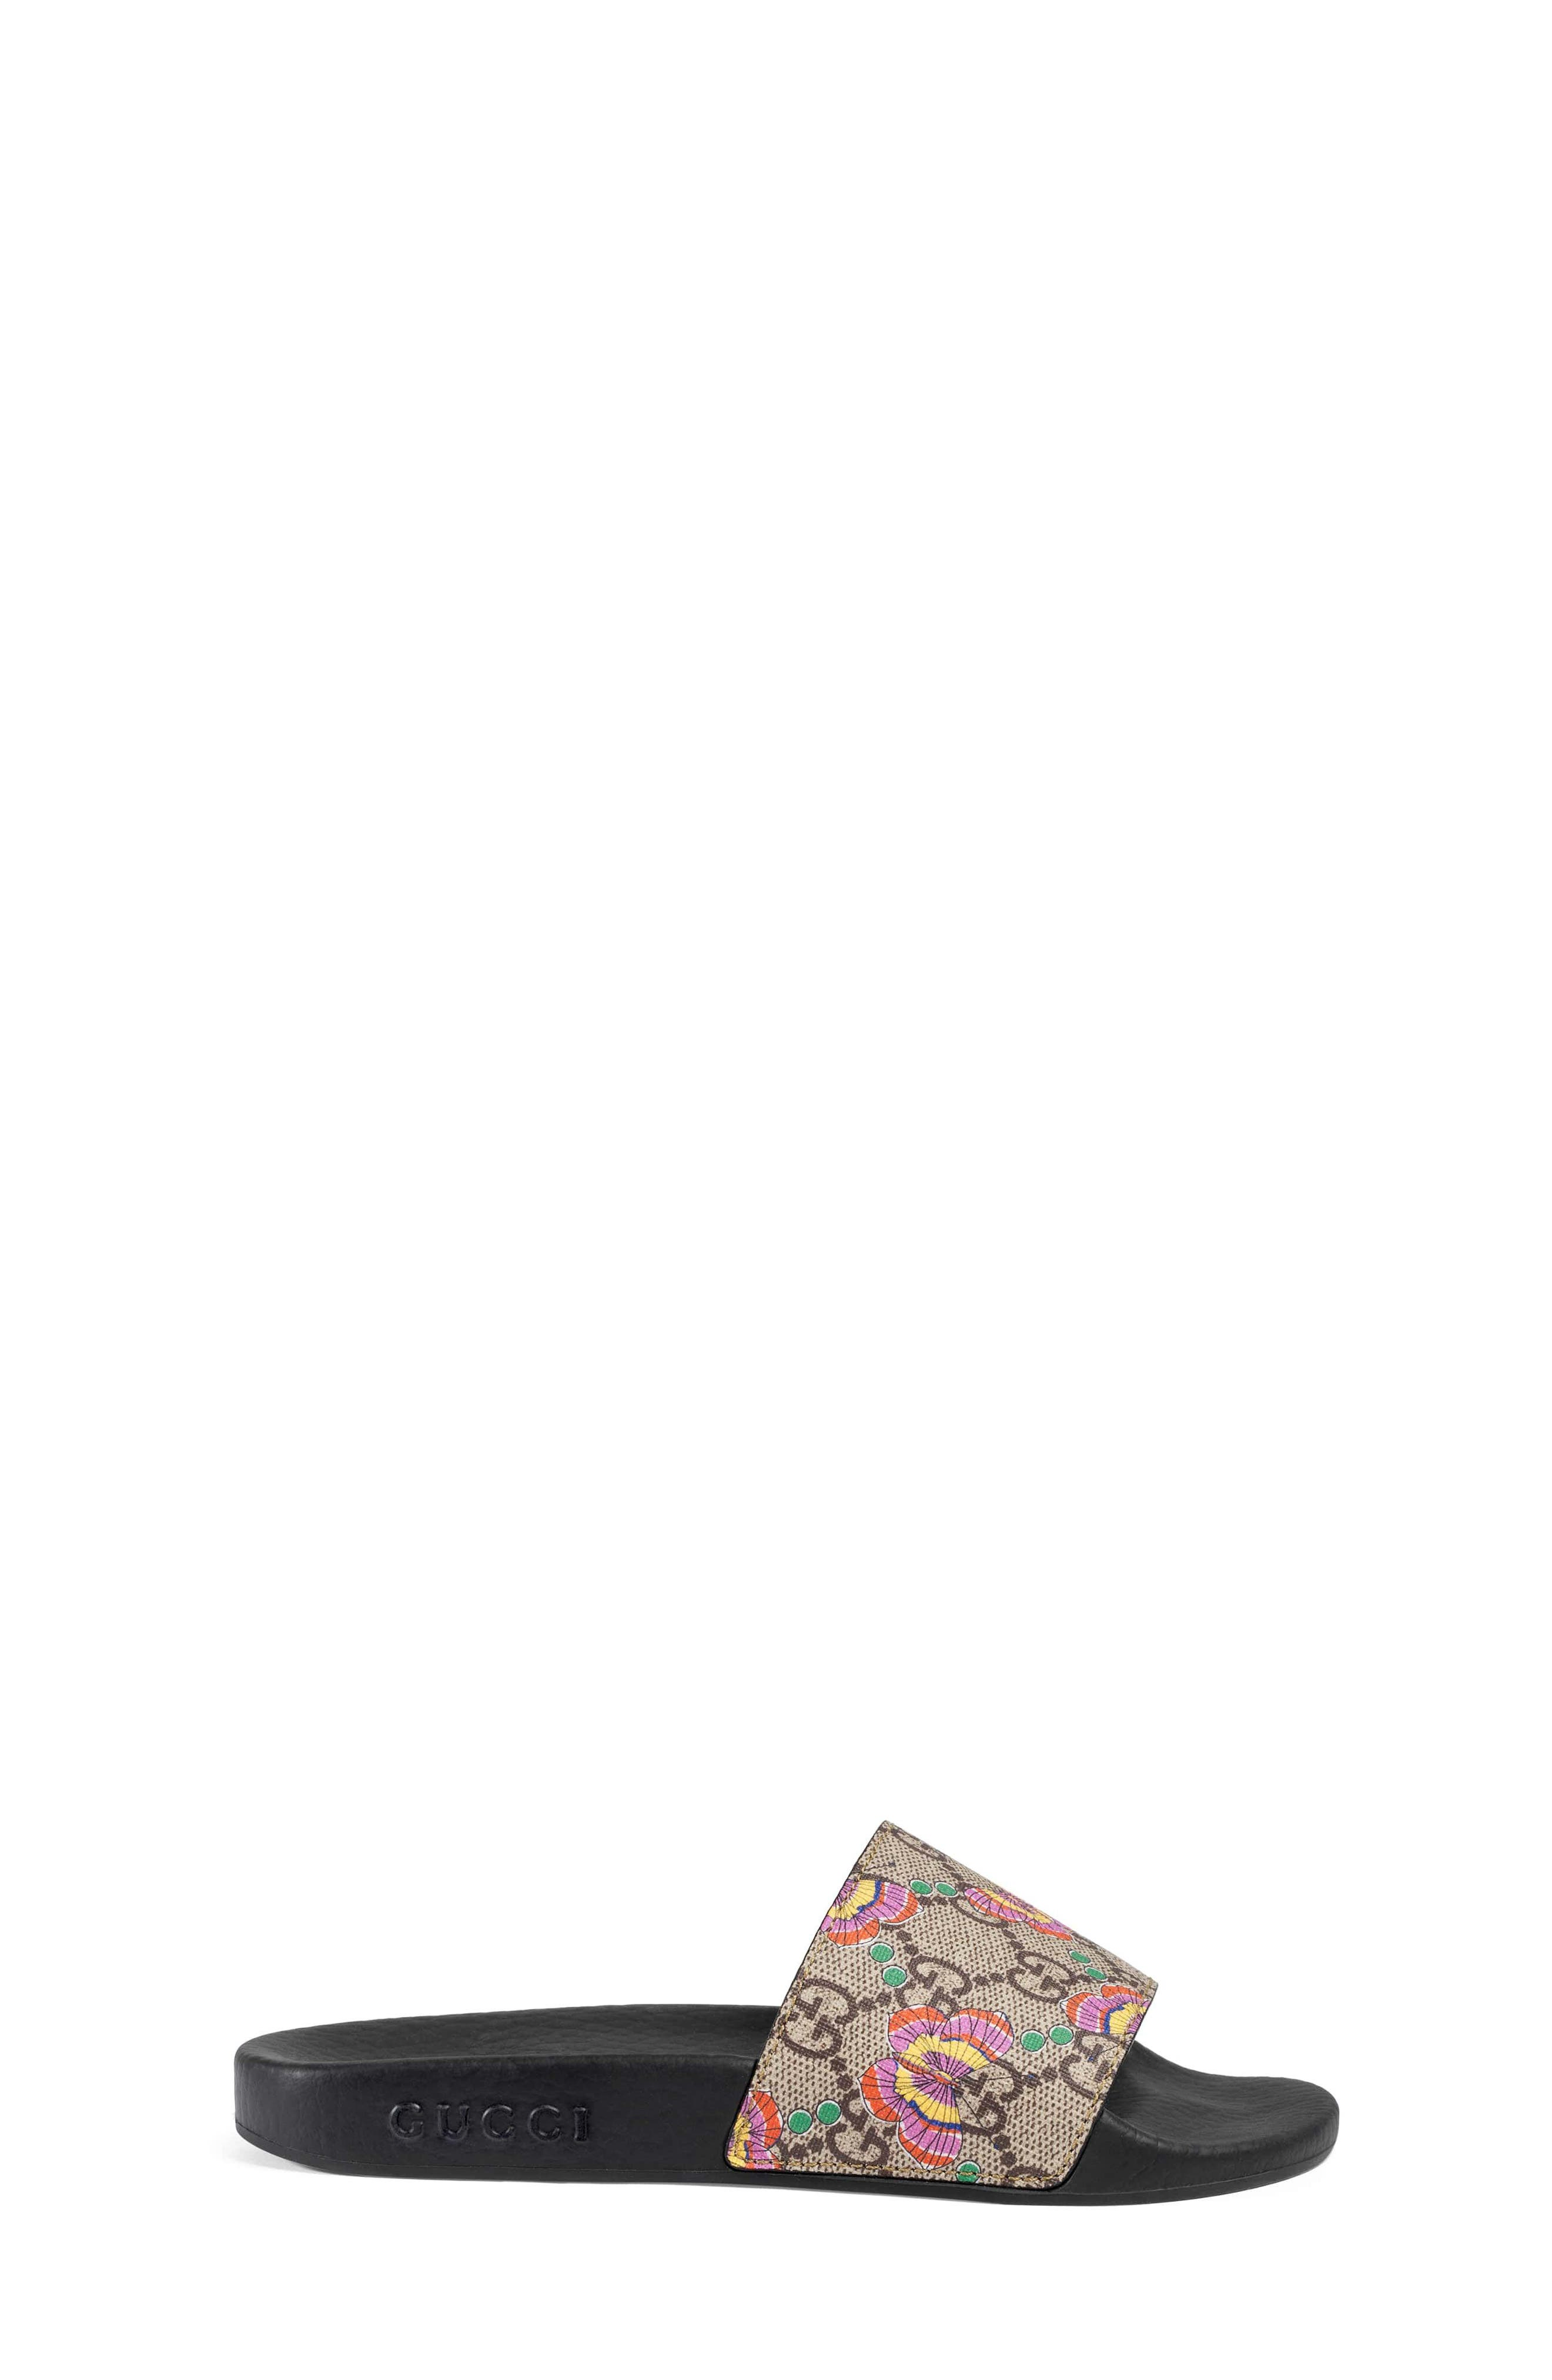 GG Supreme Butterfly Slide Sandal,                             Alternate thumbnail 2, color,                             Beige/ Pink Multi